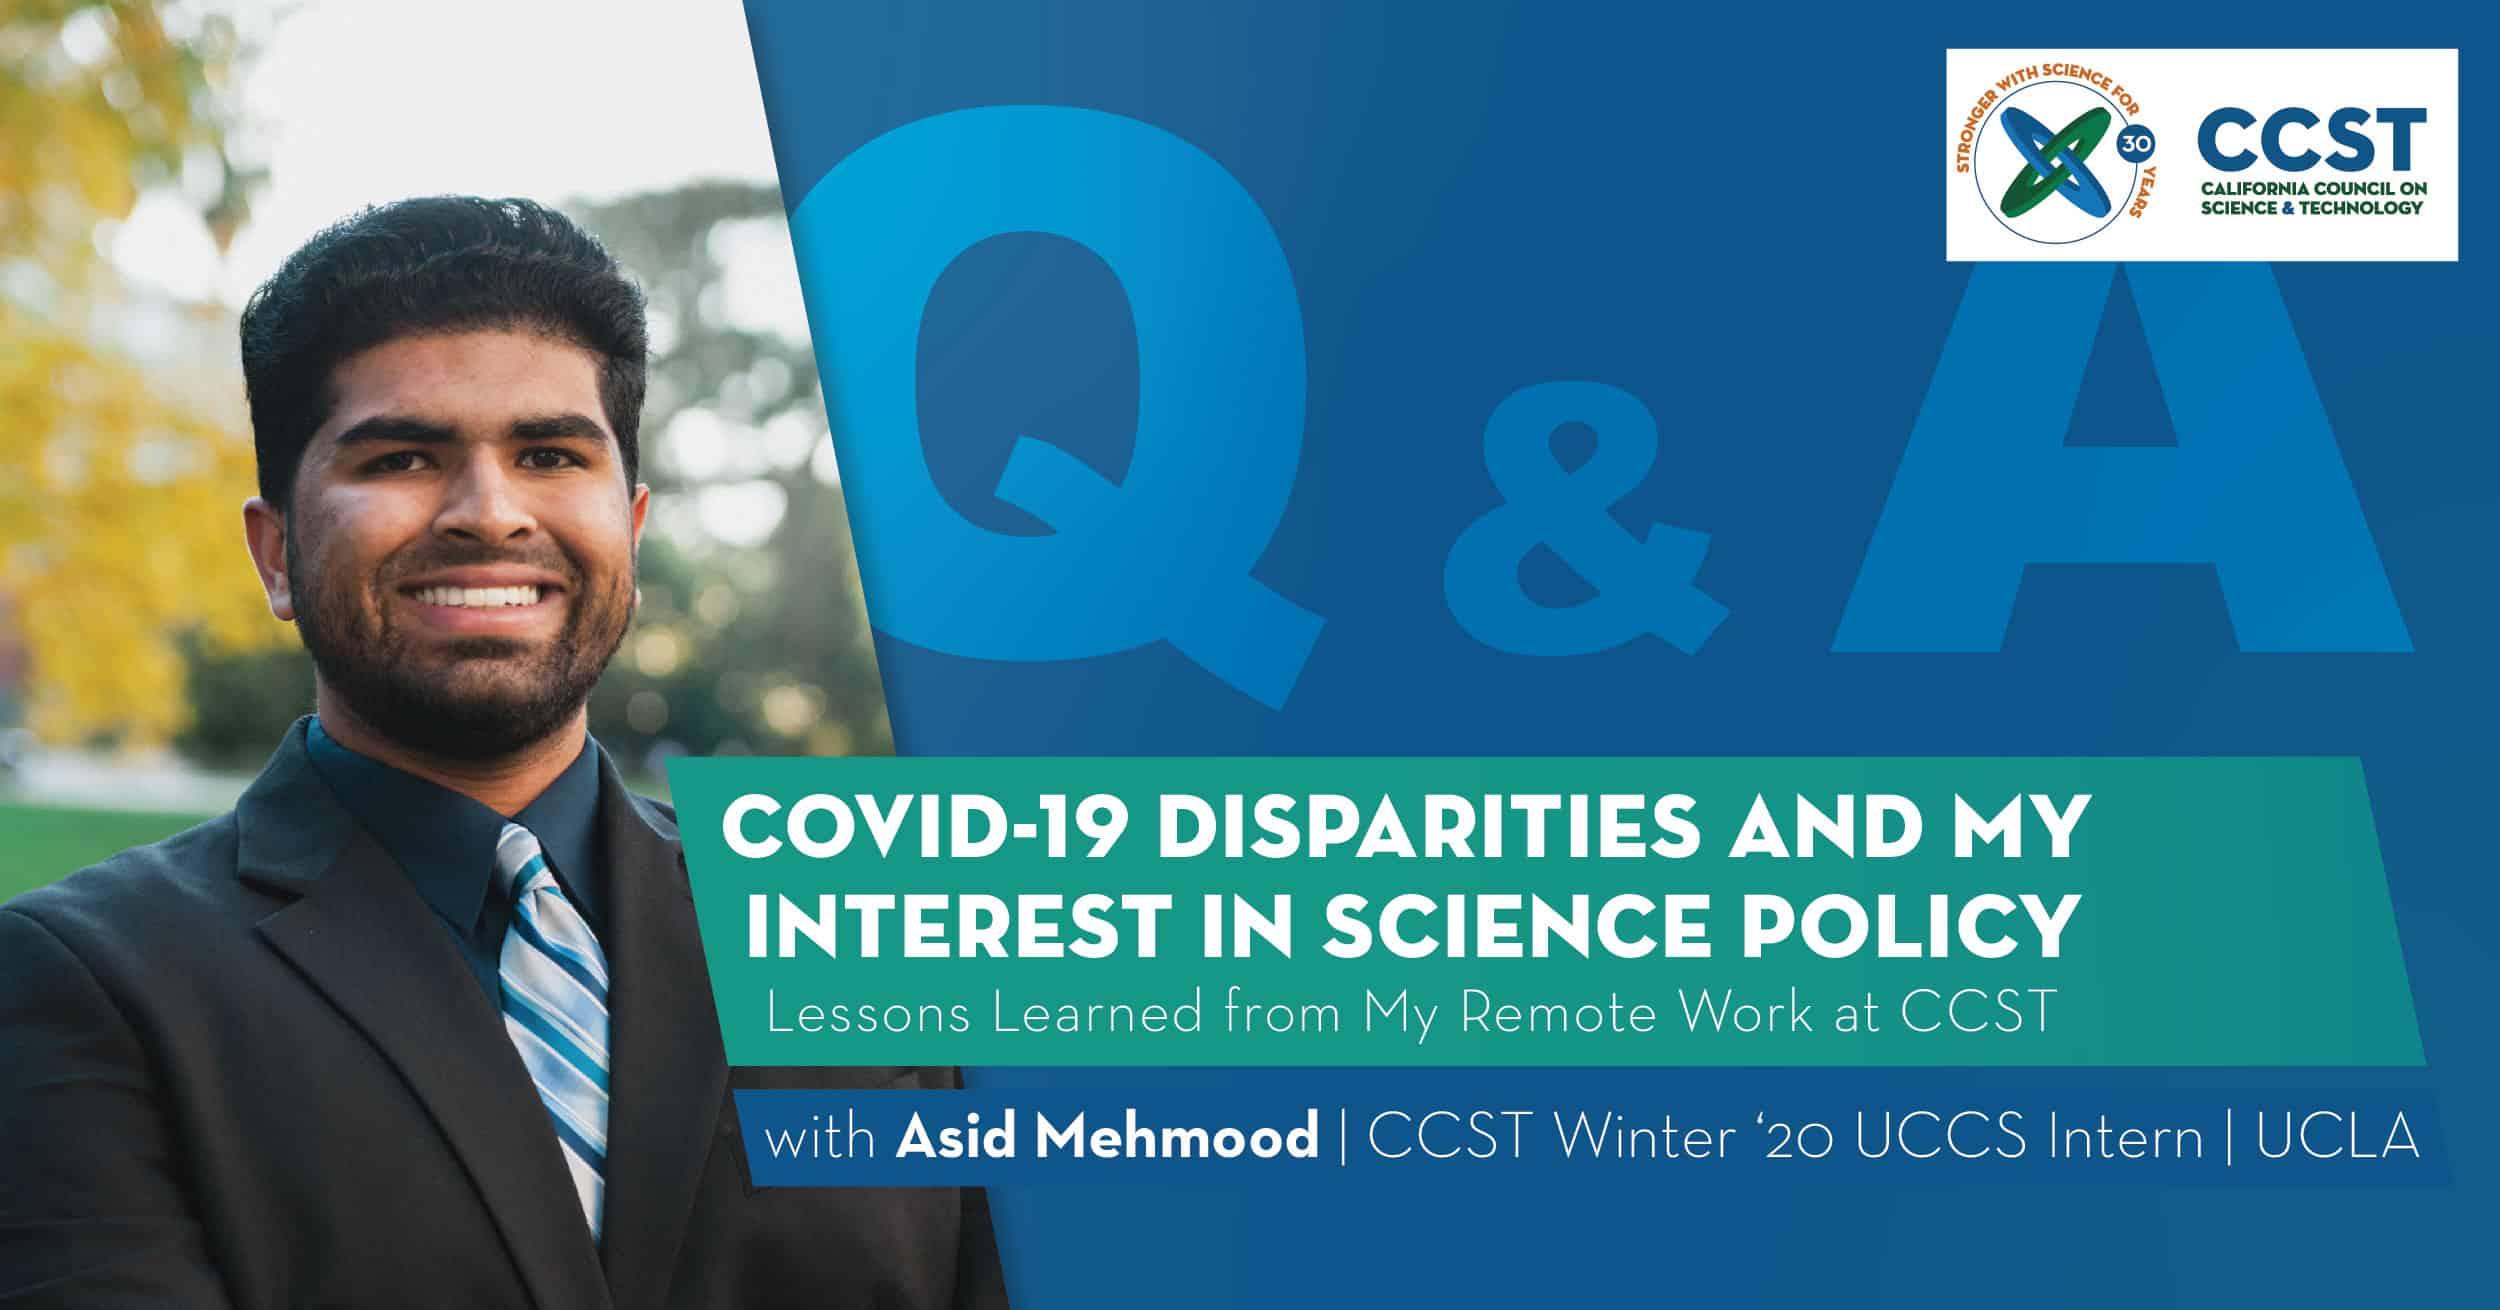 Asid Mehmood Q&A